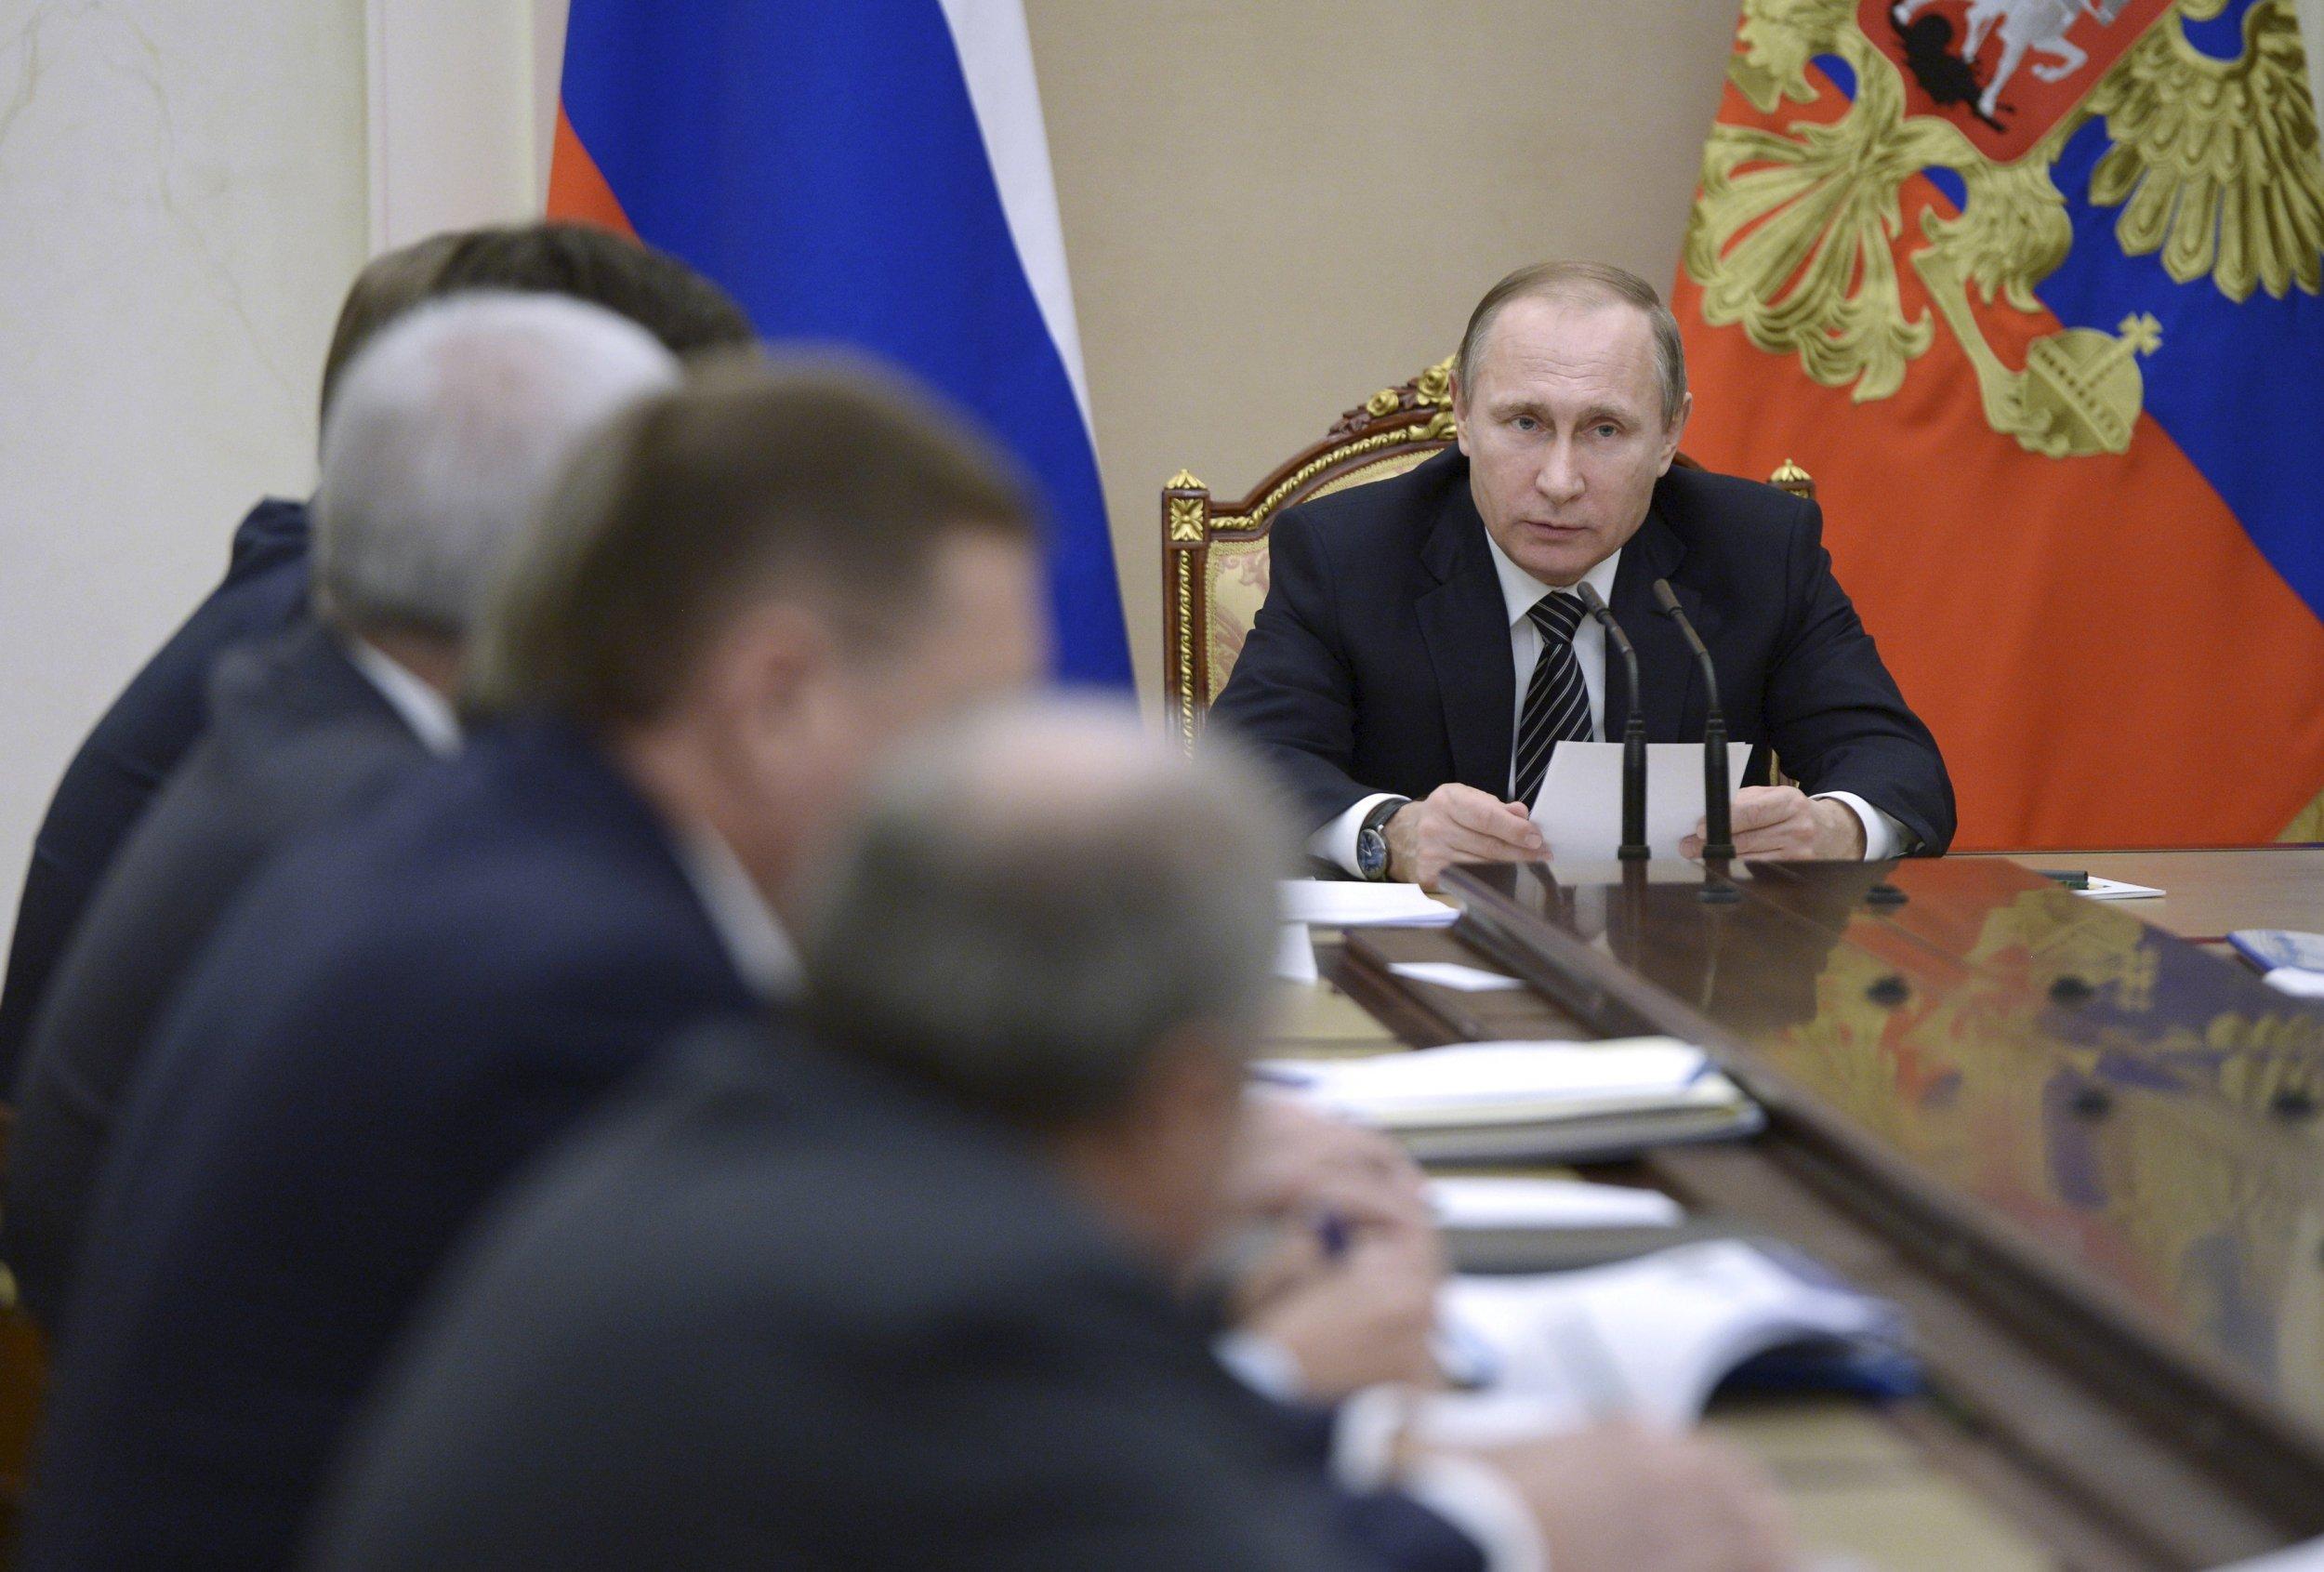 Putin speaks to oil company bosses